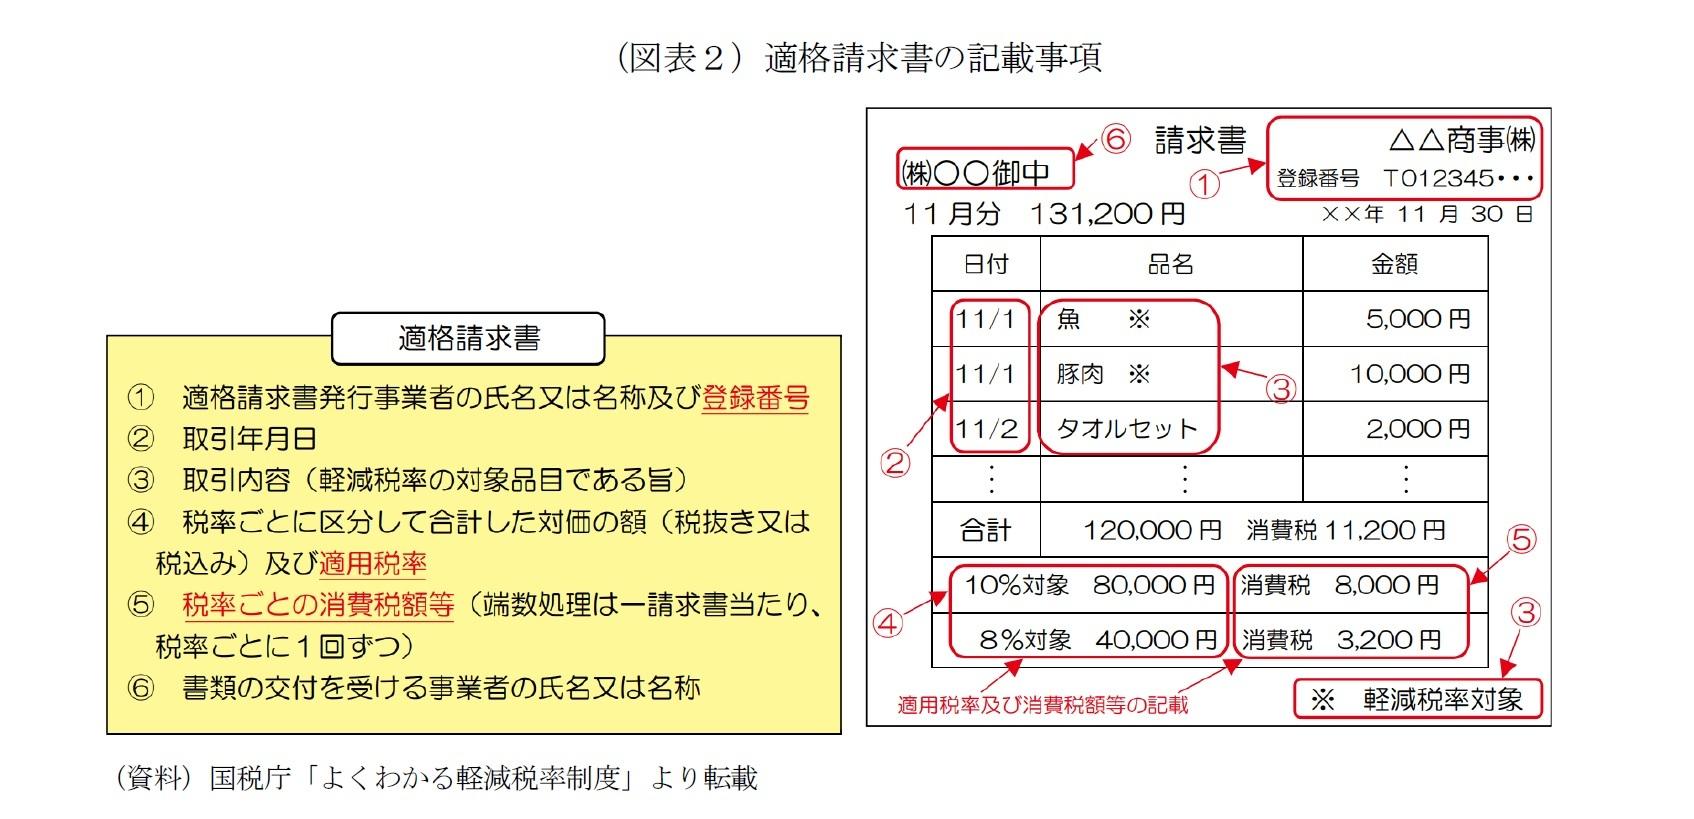 (図表2)適格請求書の記載事項